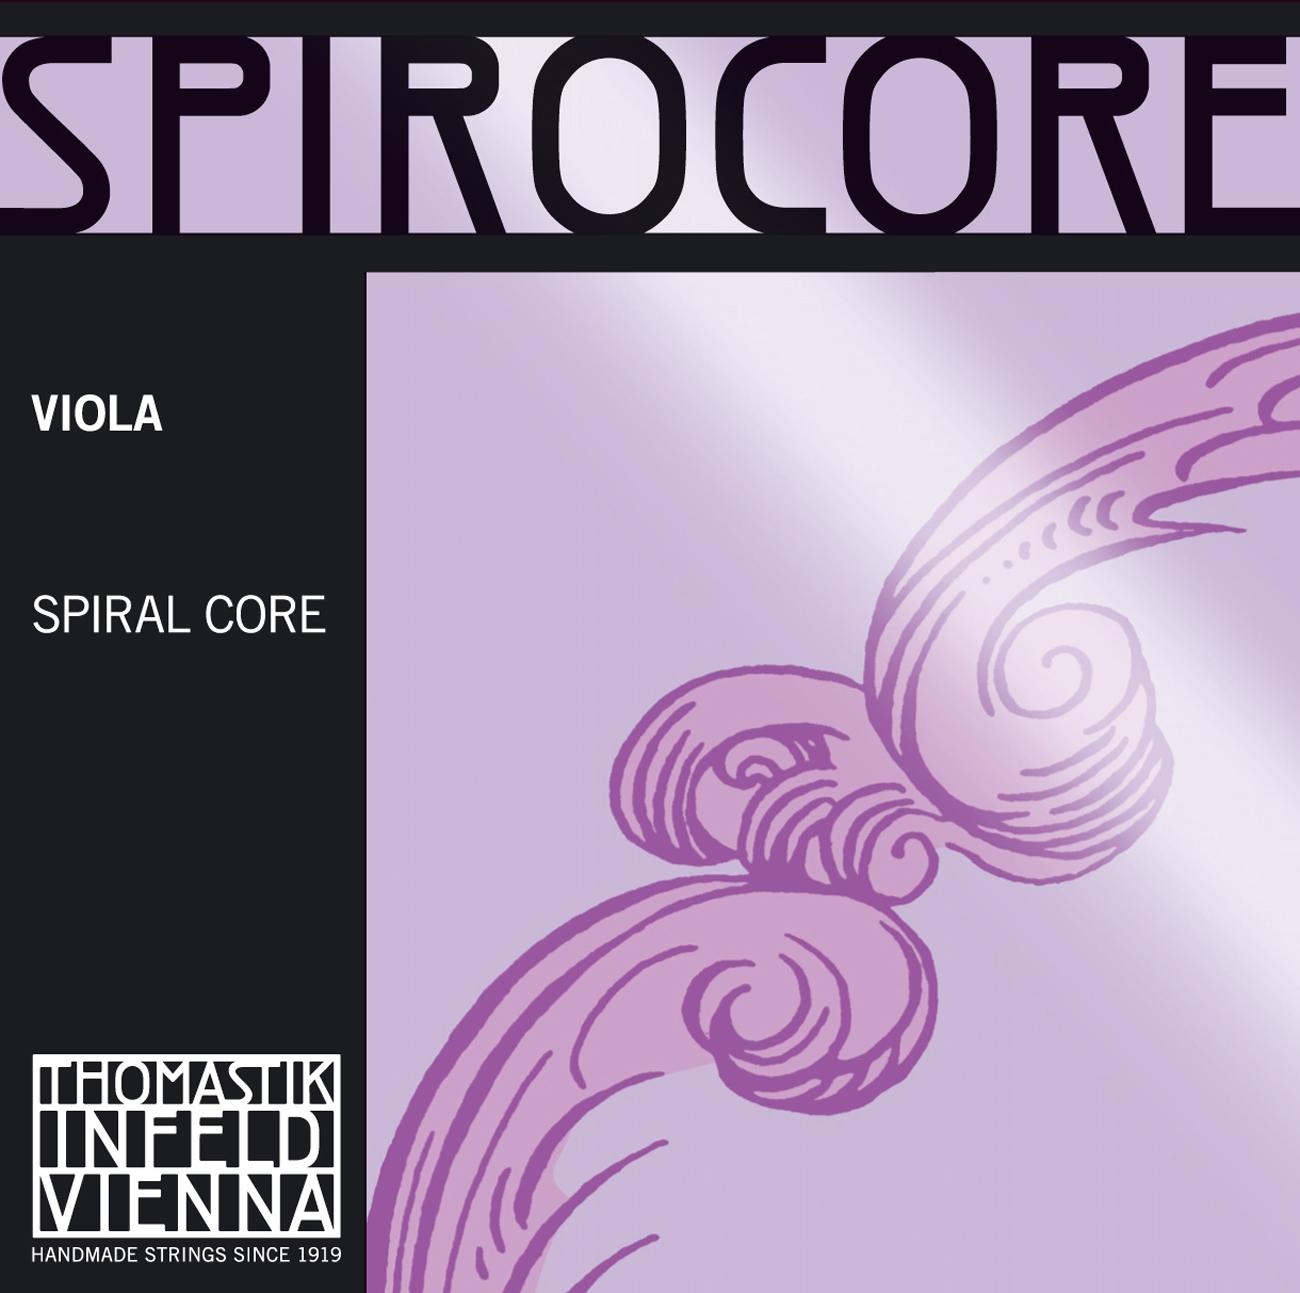 Spirocore Viola G Chrome Wound 39 5cm - 41cm